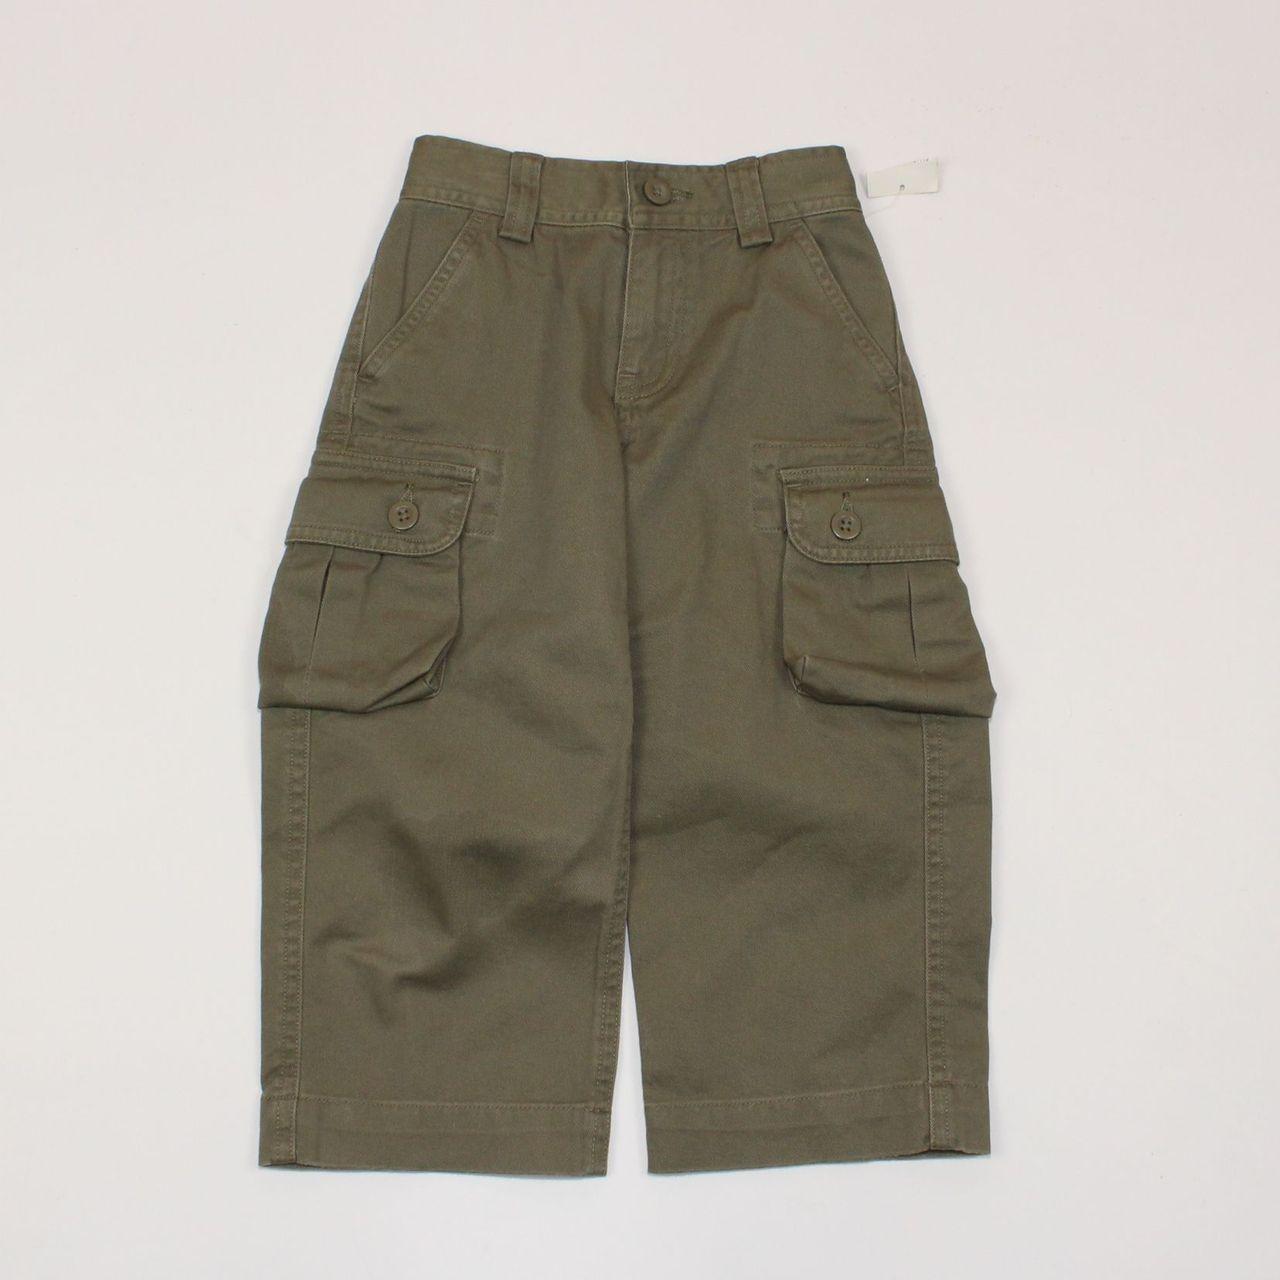 NEW Polo Ralph Lauren black cargo adjustable  khaki shorts boys 2T or 3T